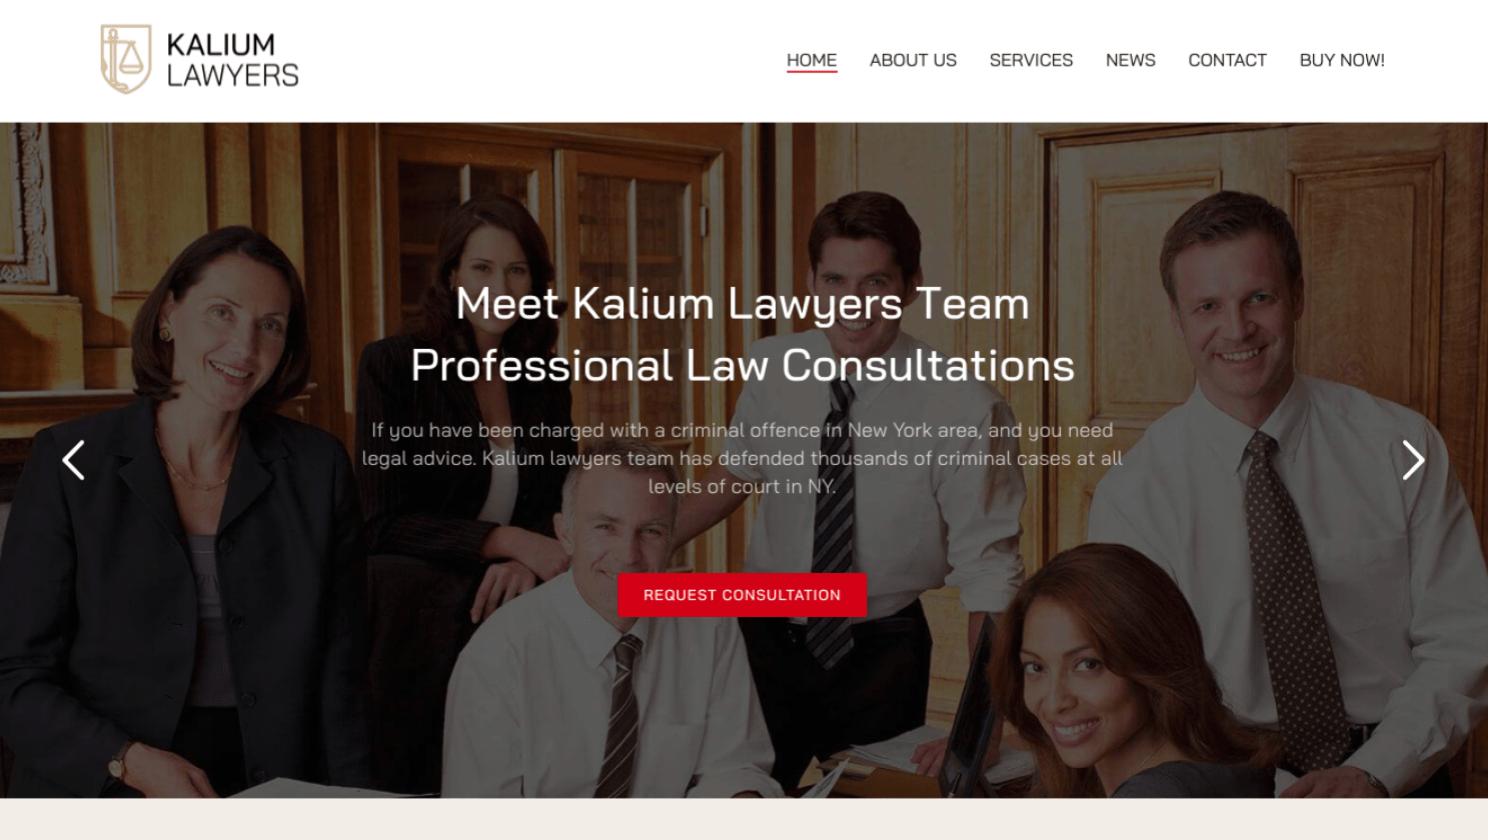 ThemeForest Kalium theme homepage